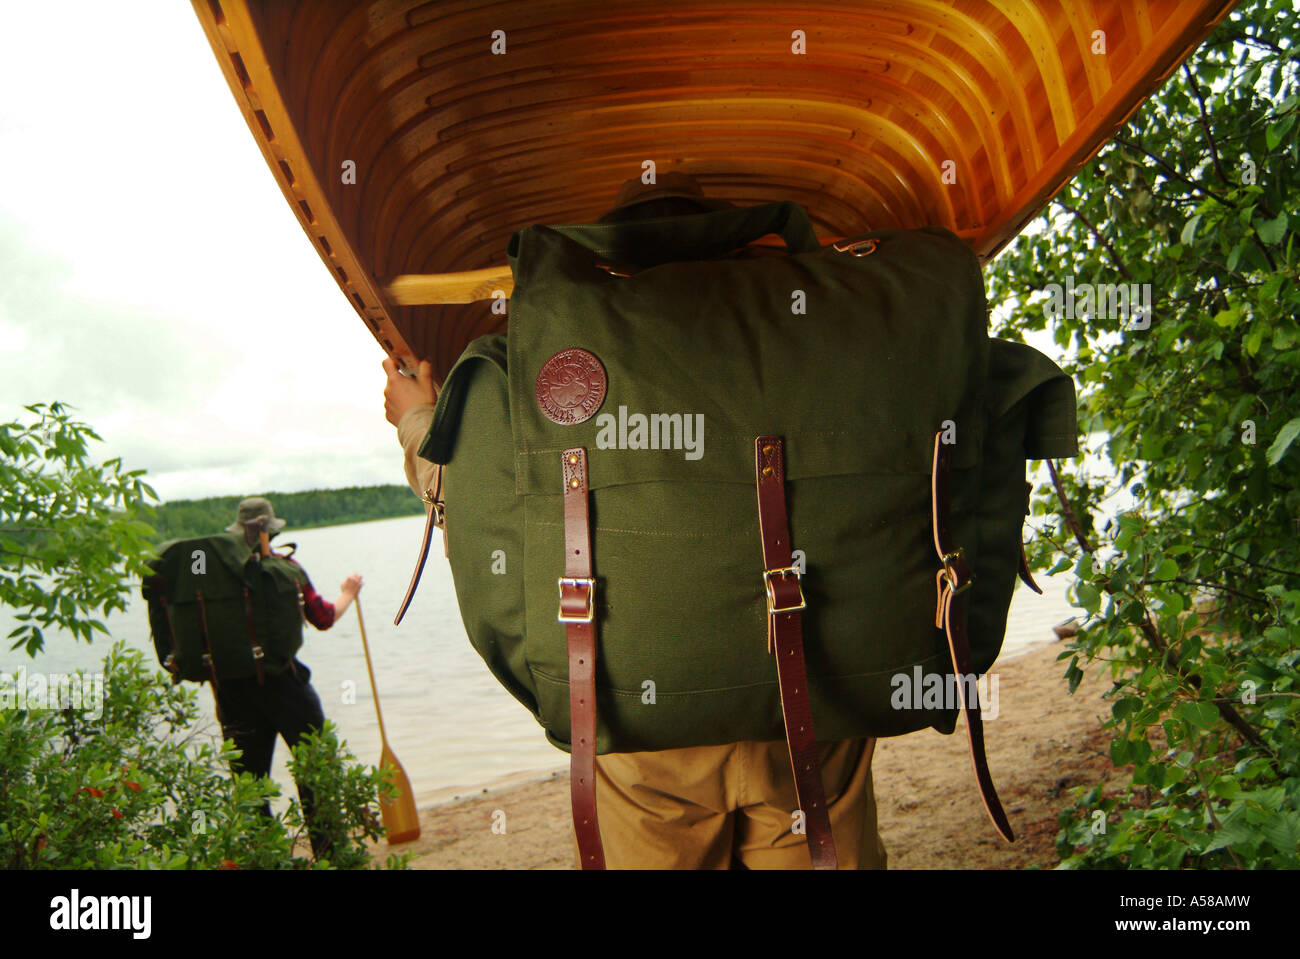 Portaging a wooden canoe in Boundary Waters Canoe Area Wilderness BWCAW Minnesota - Stock Image